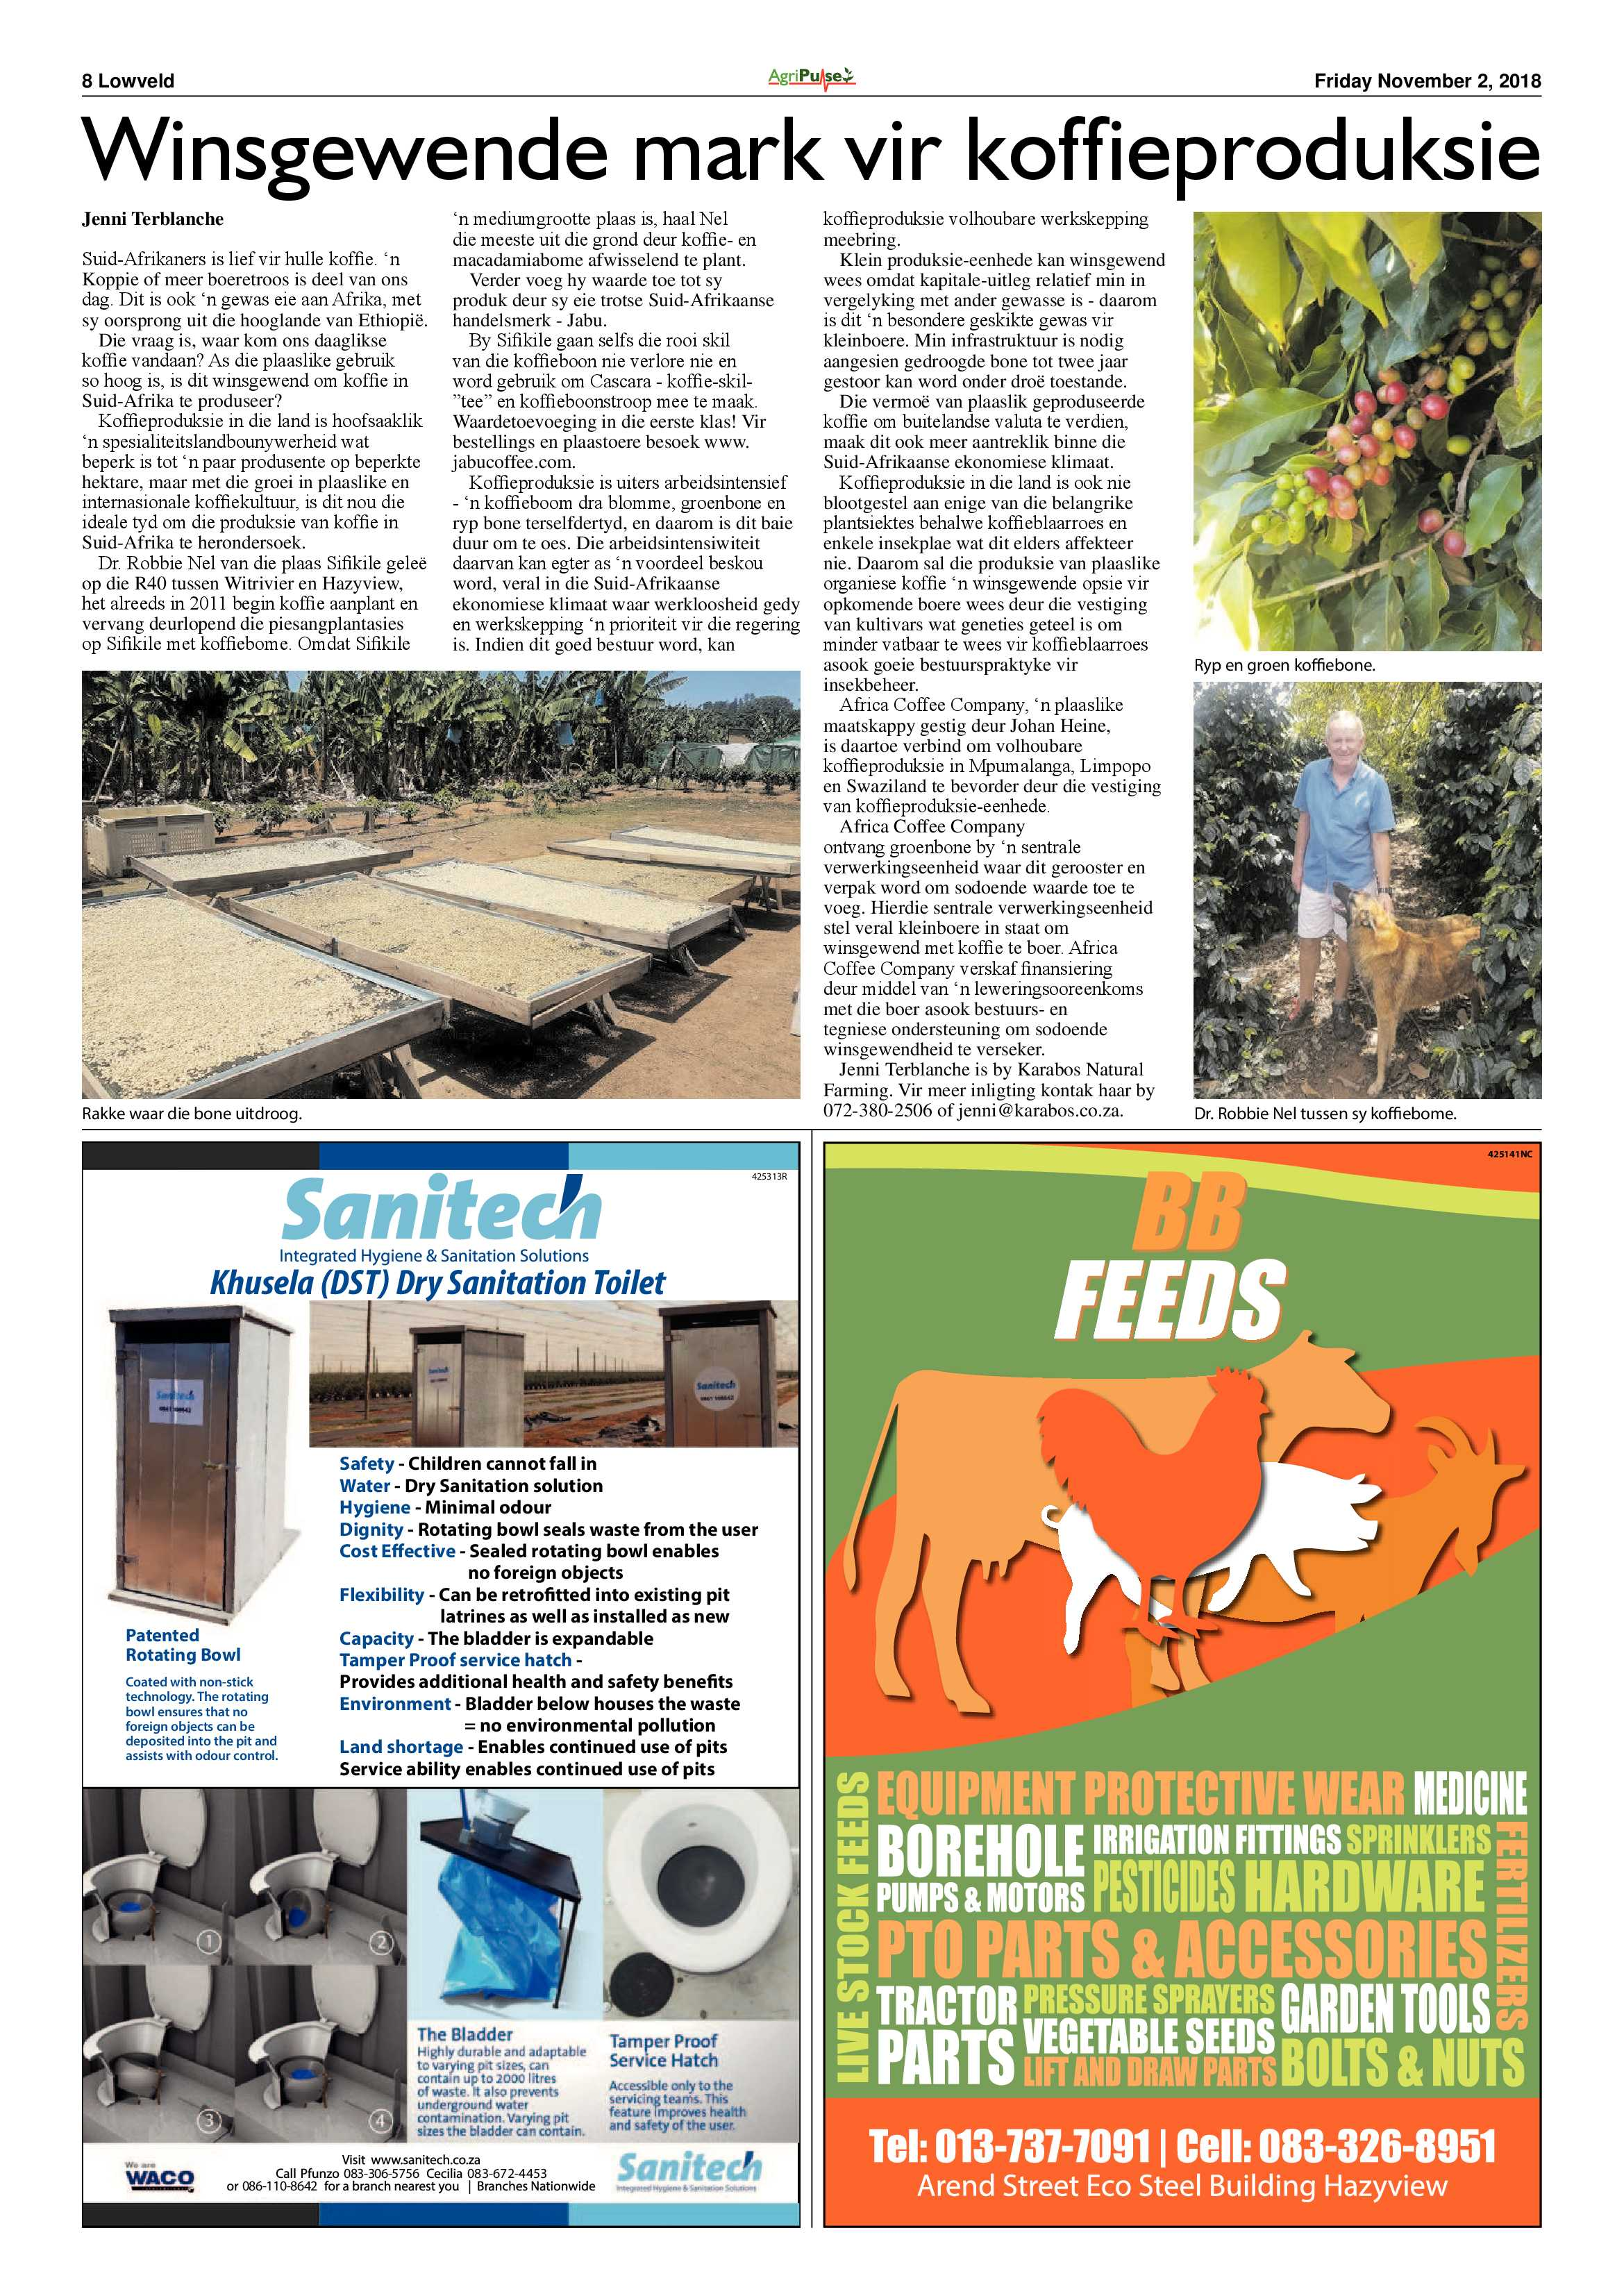 agripulse-november-2018-epapers-page-8